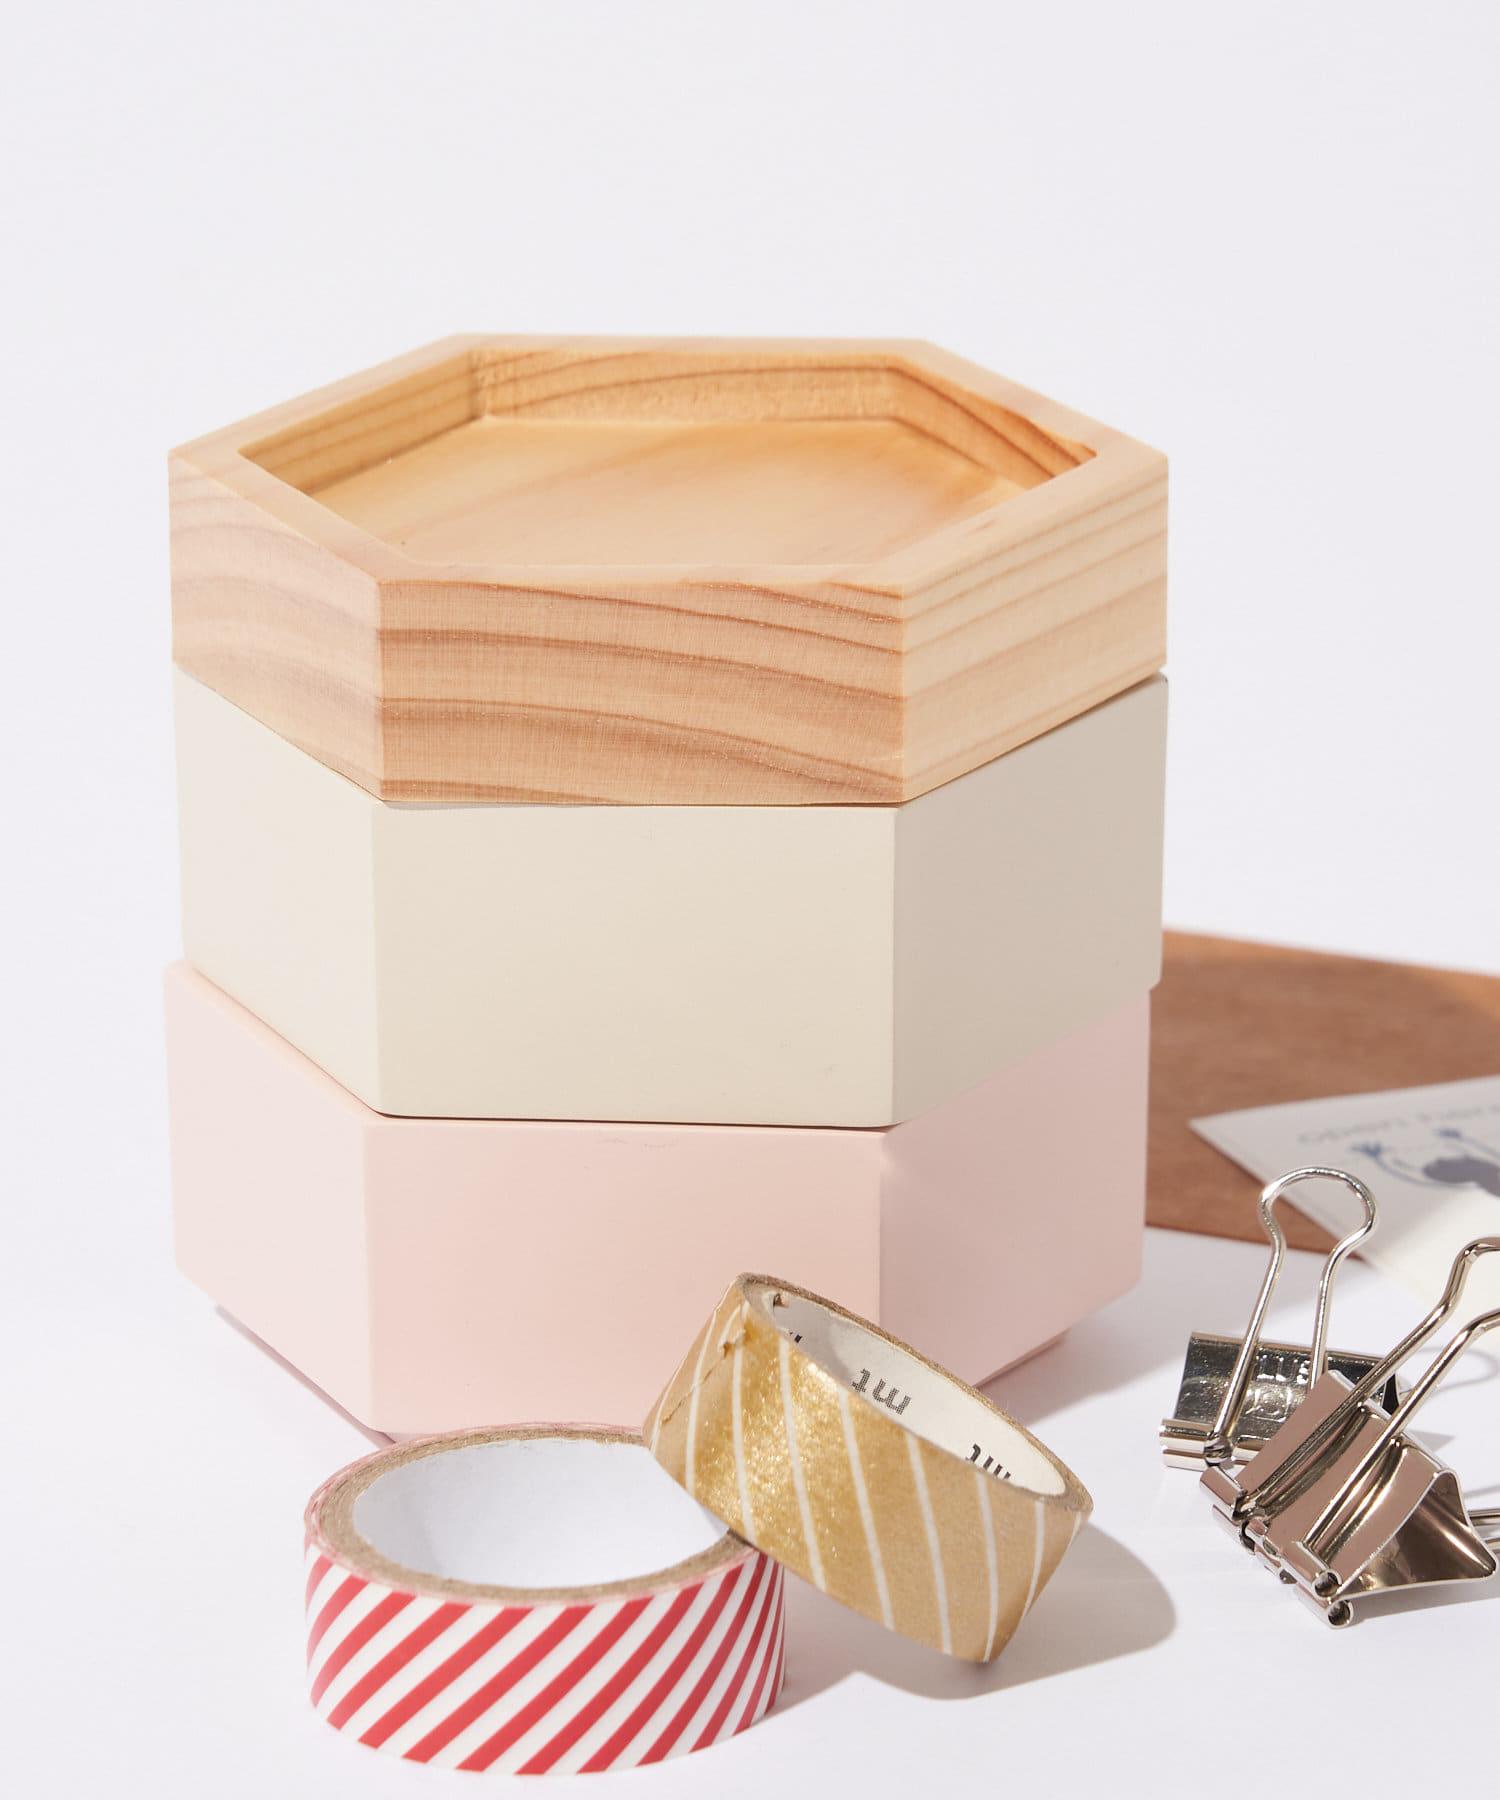 BIRTHDAY BAR(バースデイバー) ライフスタイル Kerata CONTAINER SHORT 小物ケース ピンク